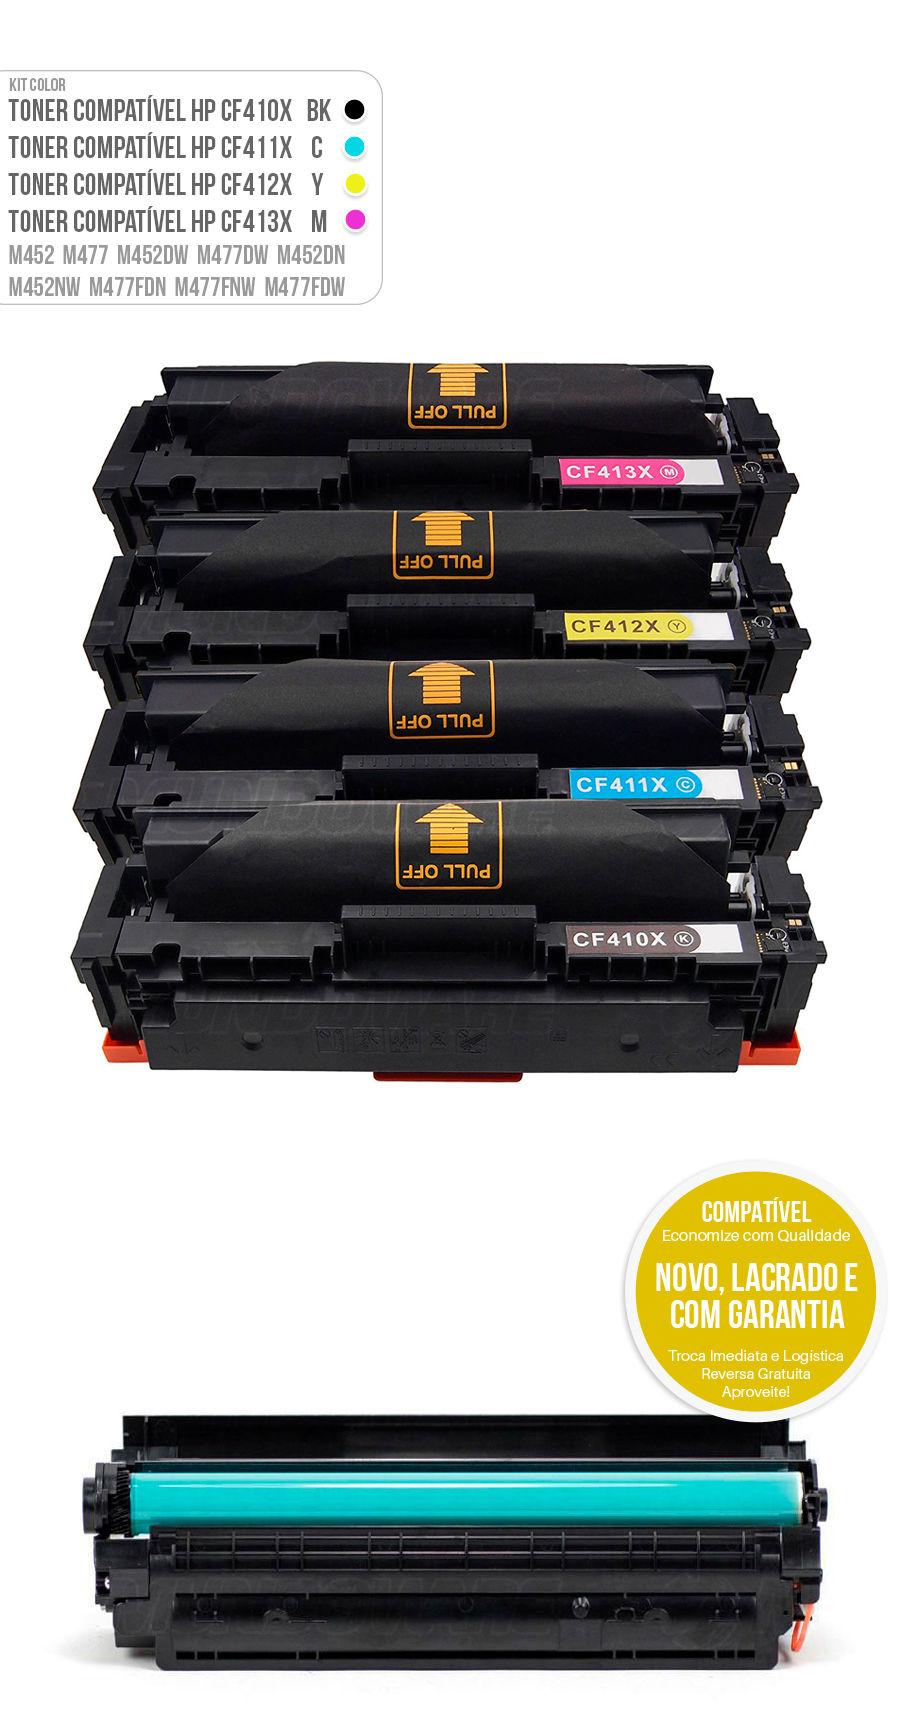 Kit colorido Color Laserjet M477 M452 M477FDW M452DN M477FNW M452NW Tonner HP 401X